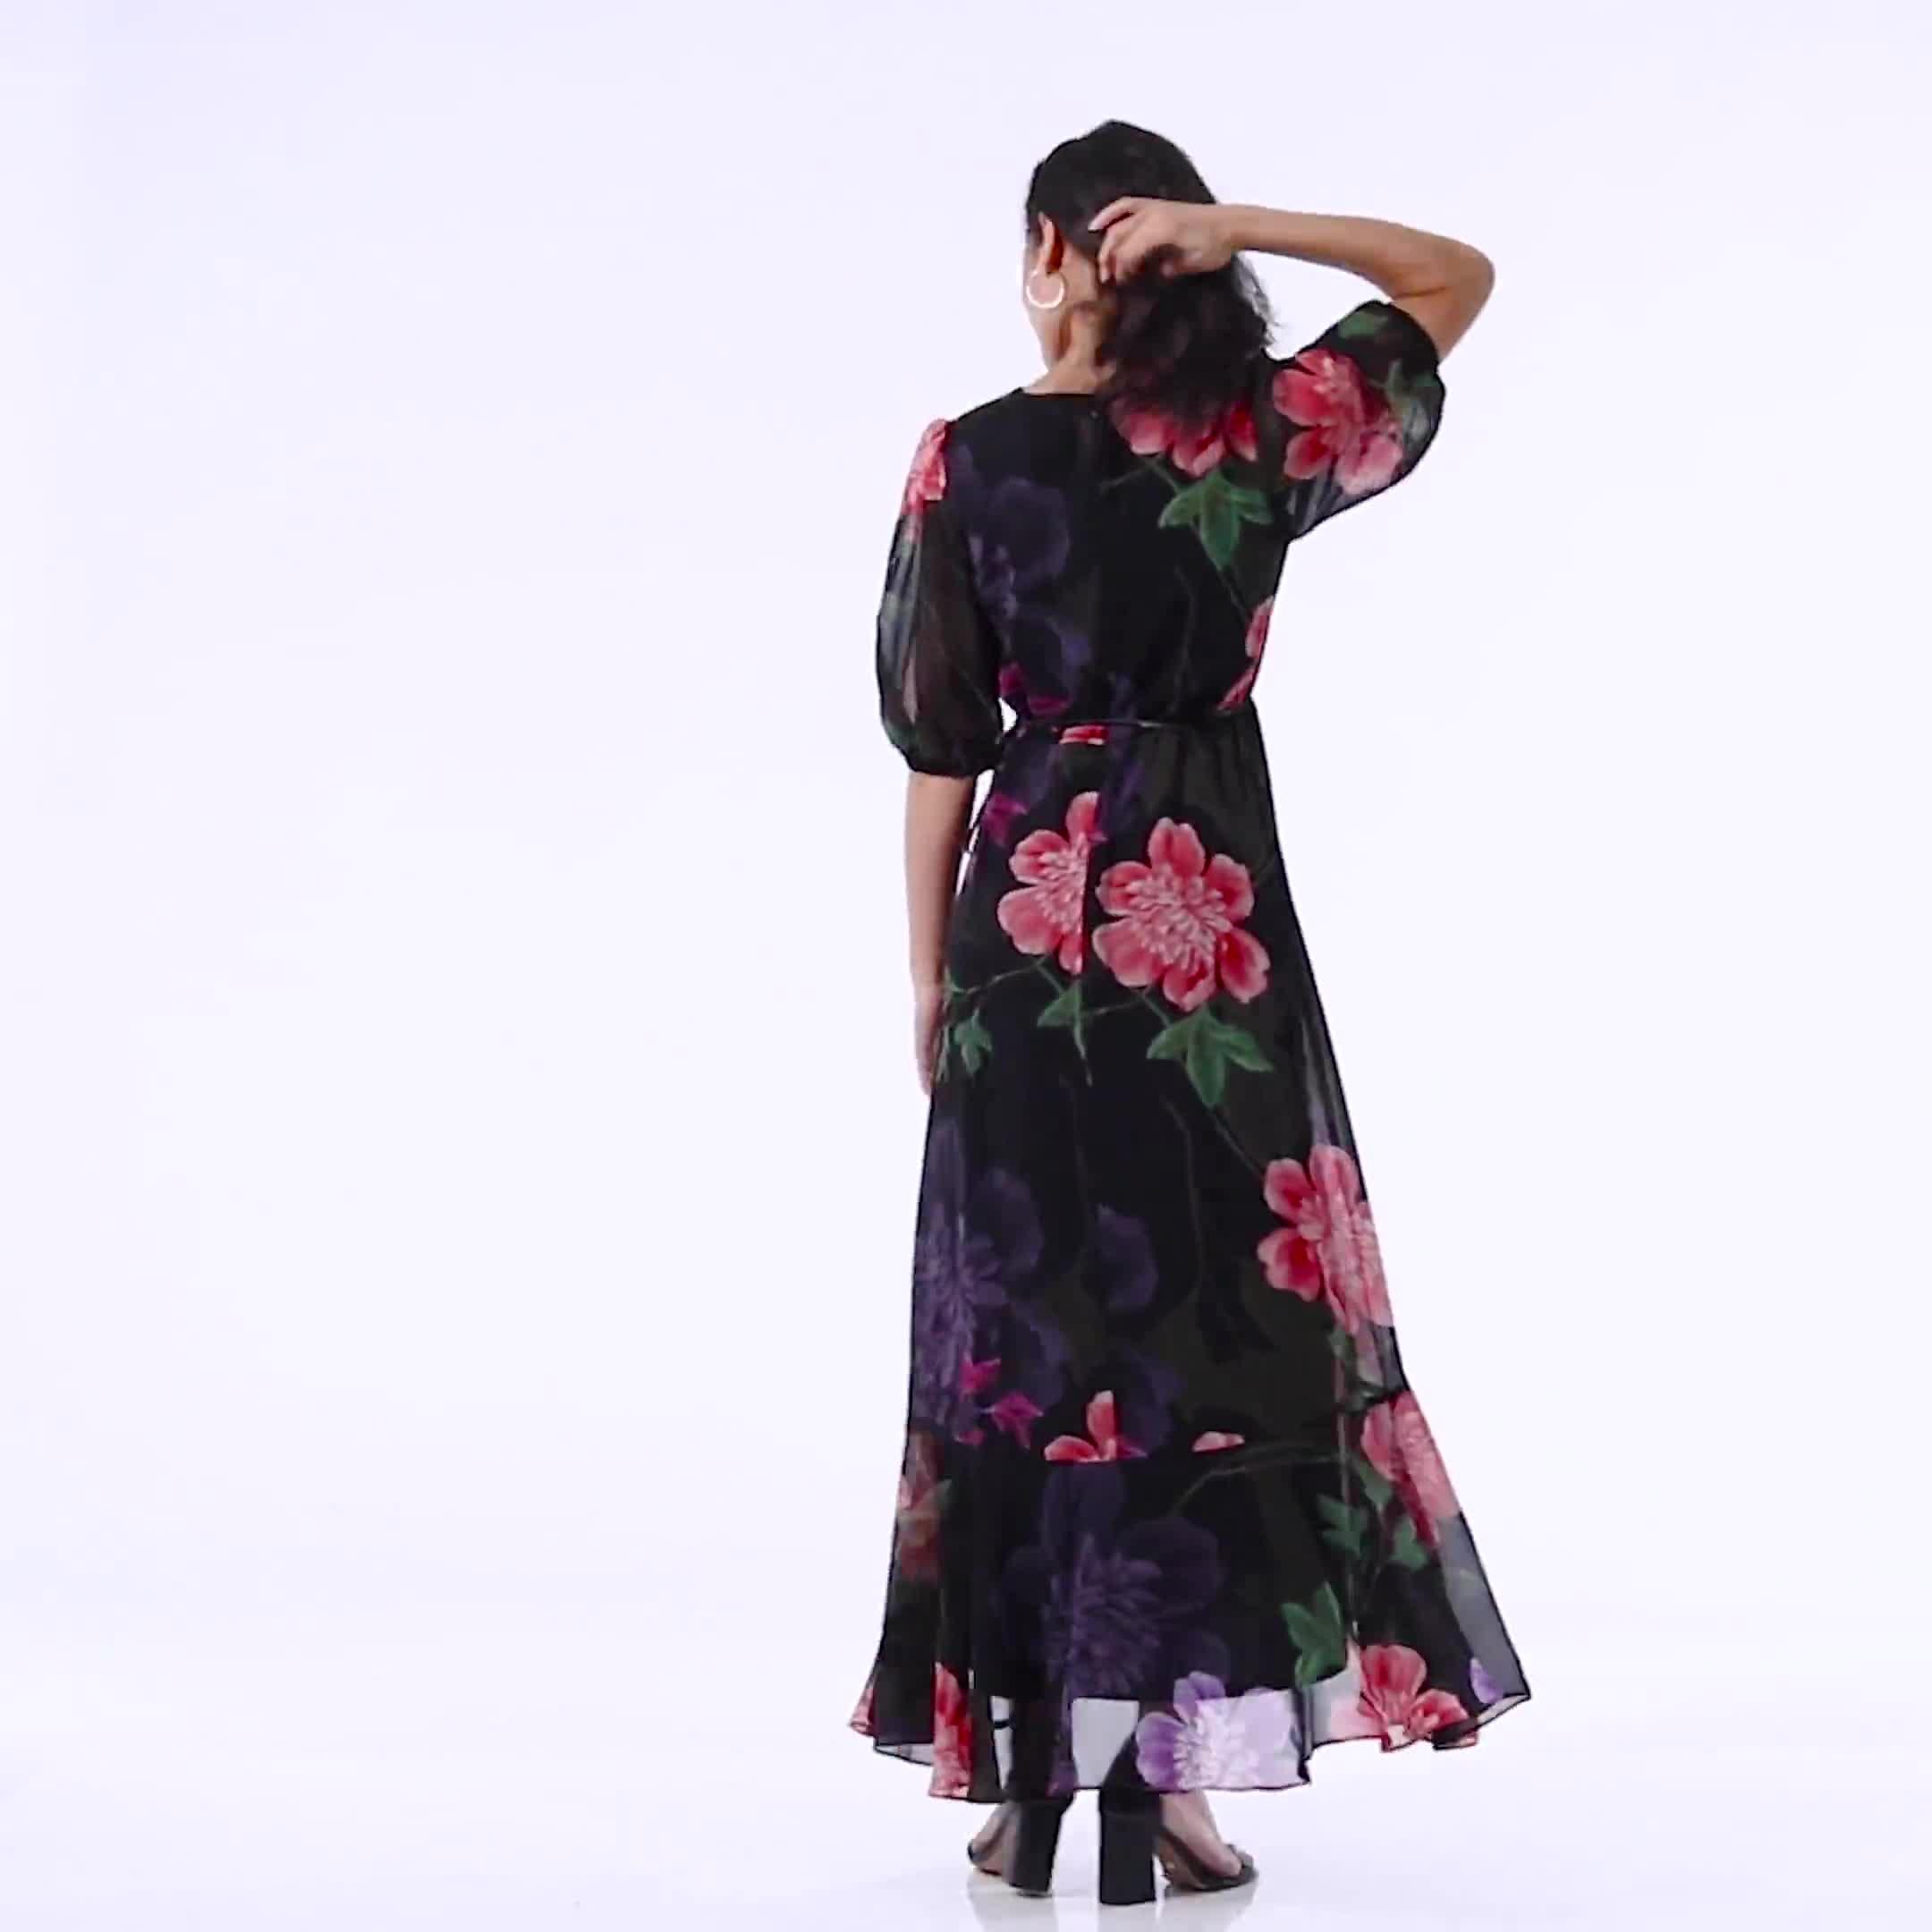 Large Floral Ruffle Dress - Plus - Video